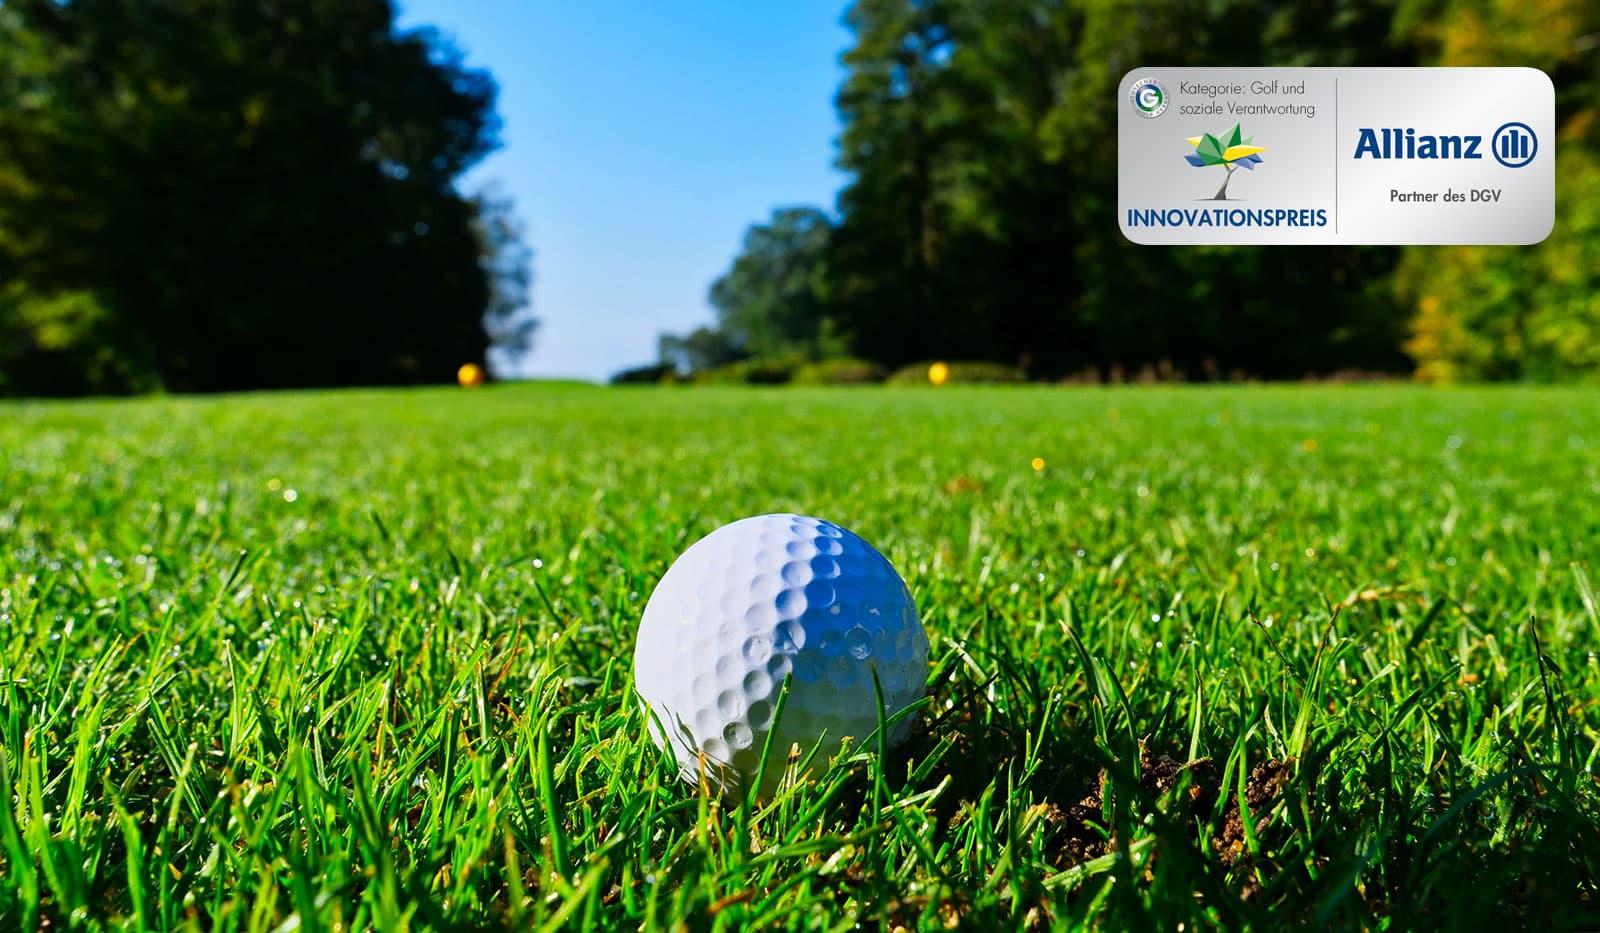 Golfball auf Rasen, DGV Innovationspreis Logo